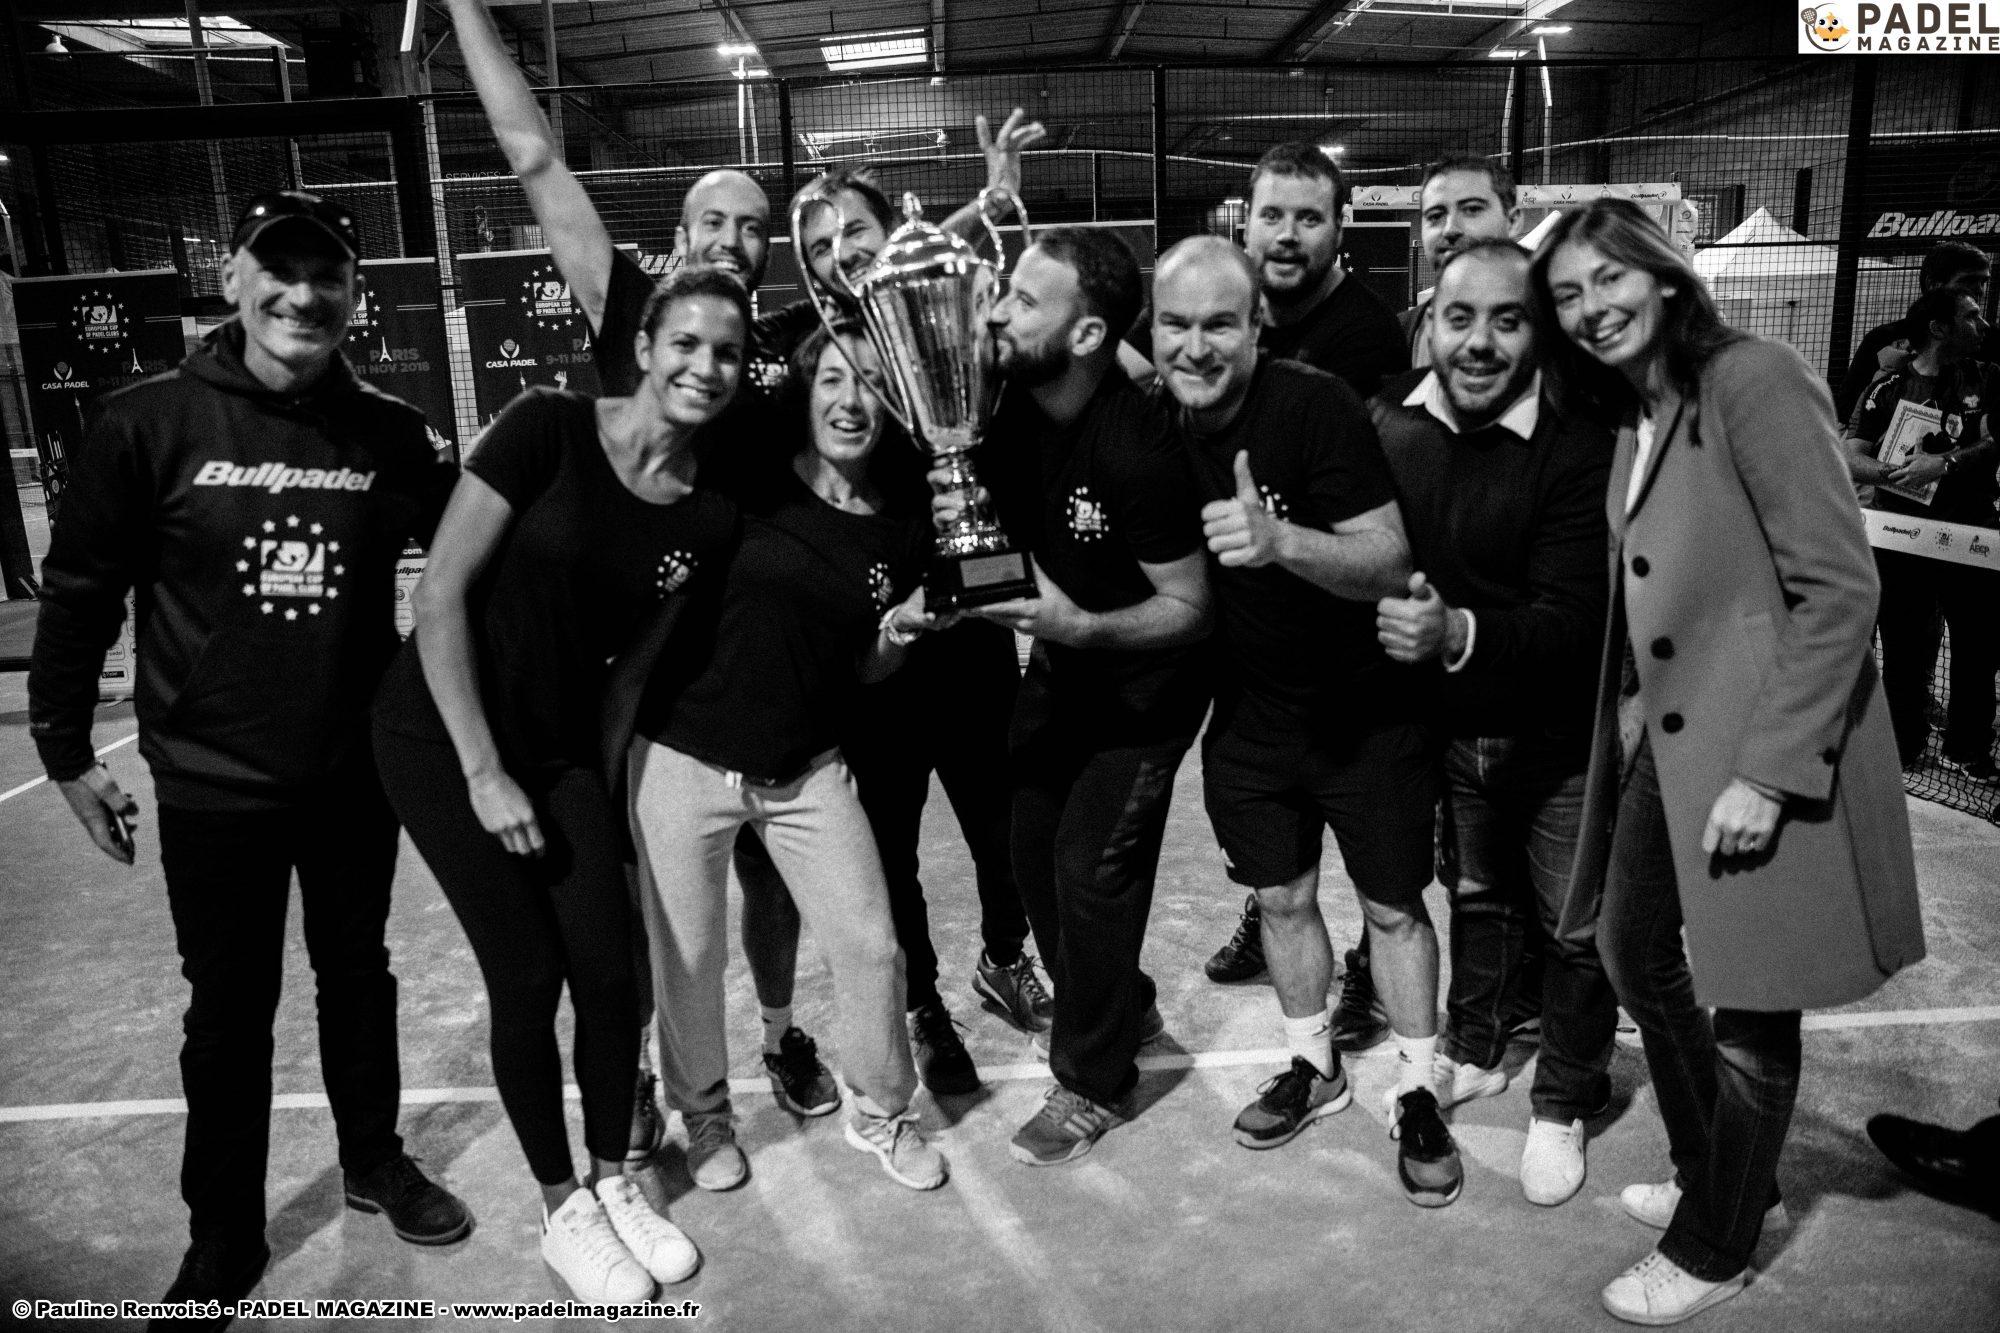 Casa Padel / Padel France Distribution remporte l'Euro Padel Cup 2018